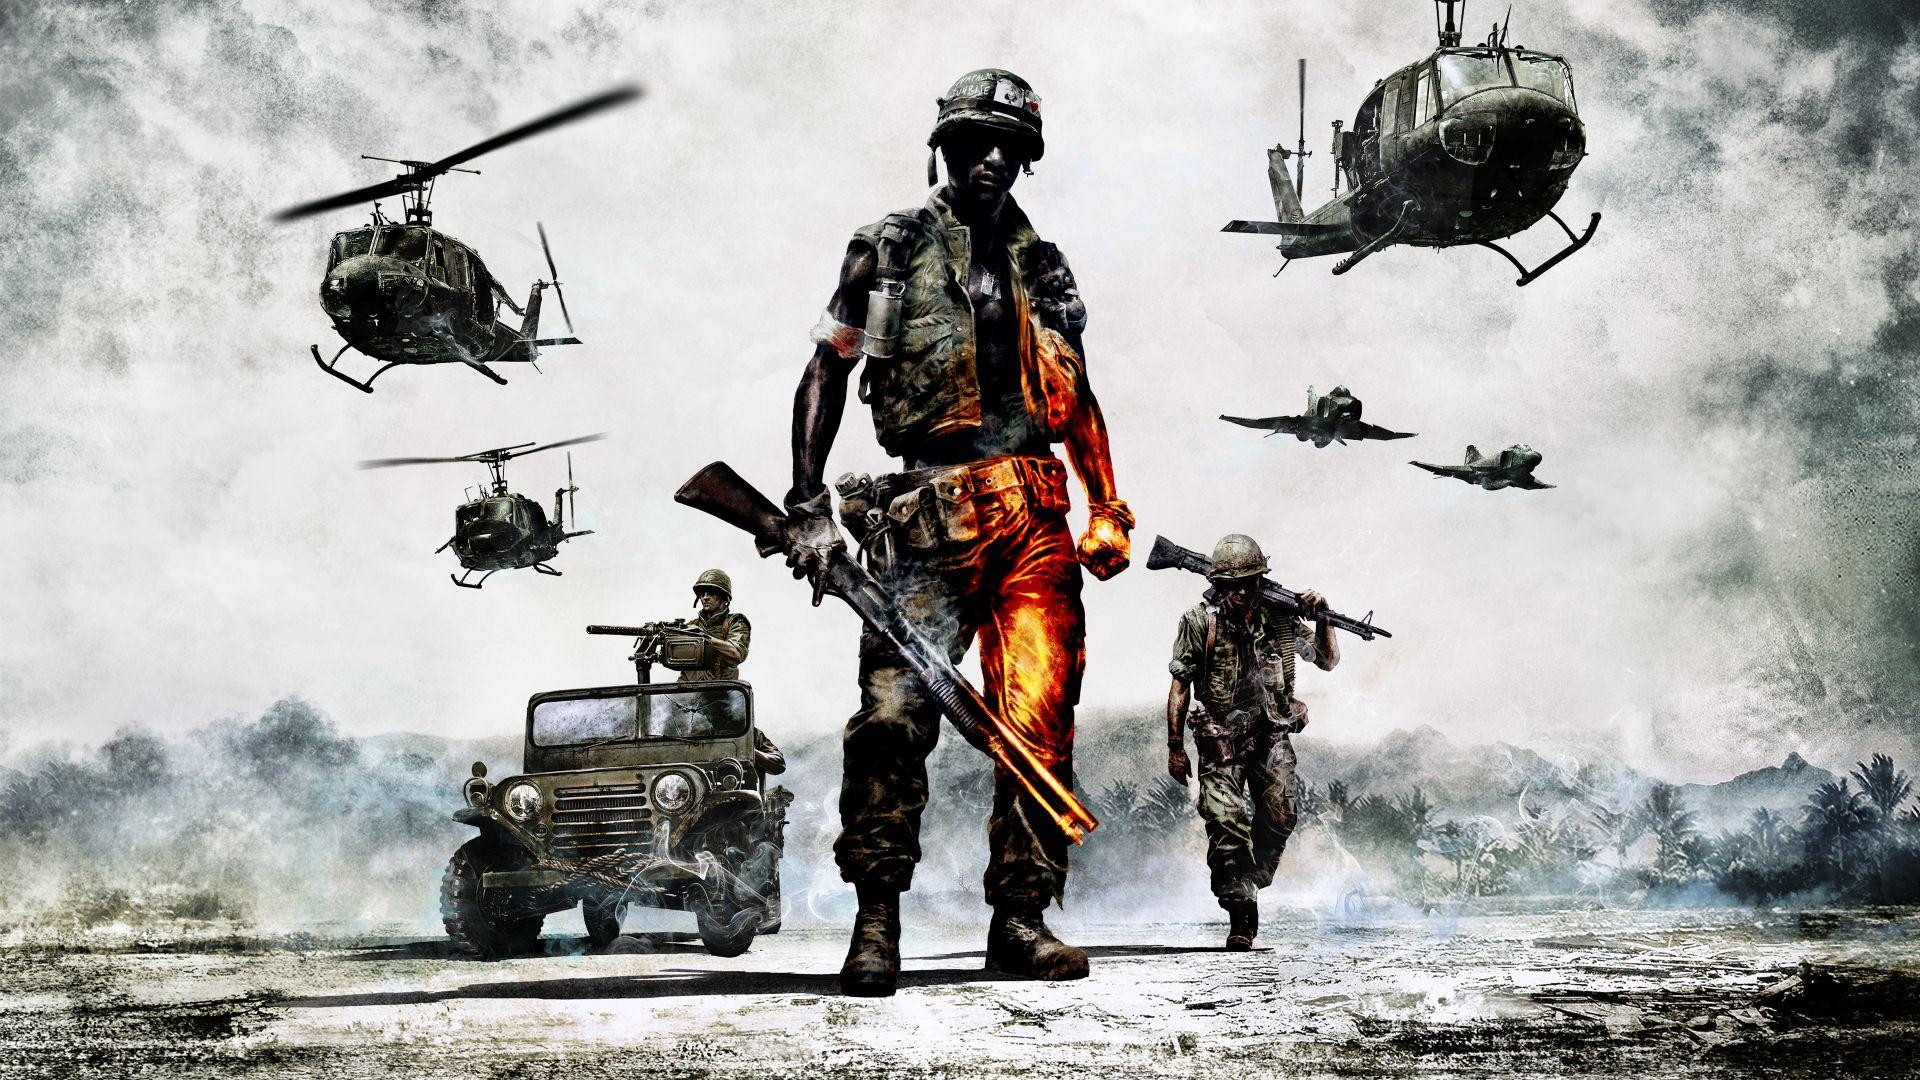 battlefield bad company 2 serial key multiplayer free